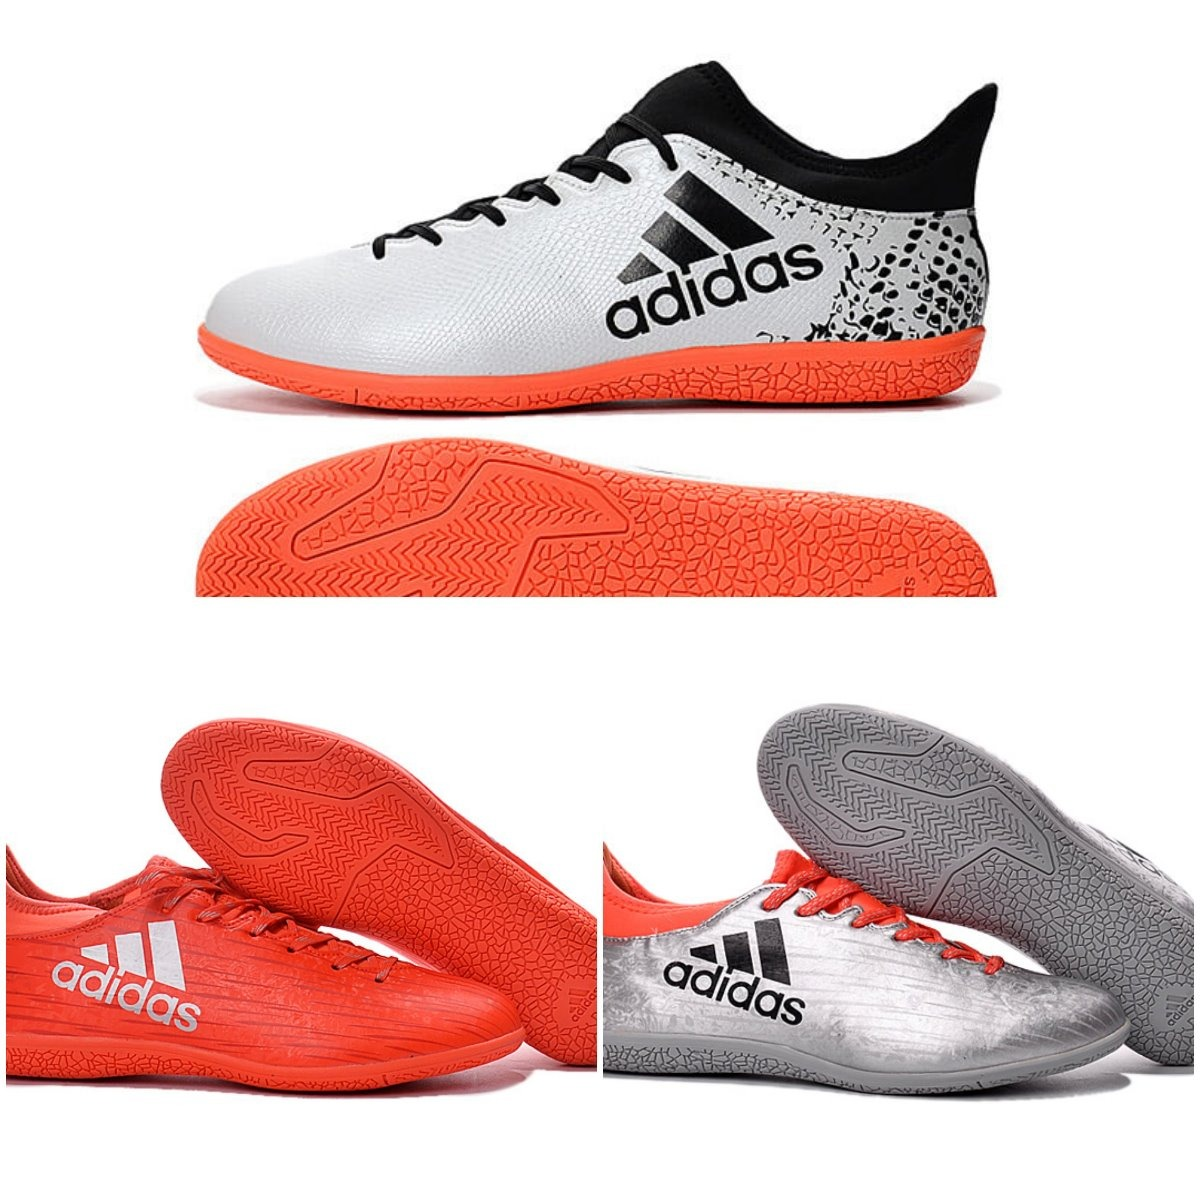 3341fc1af9d botines botitas adidas - futsal - talle 36. Cargando zoom.